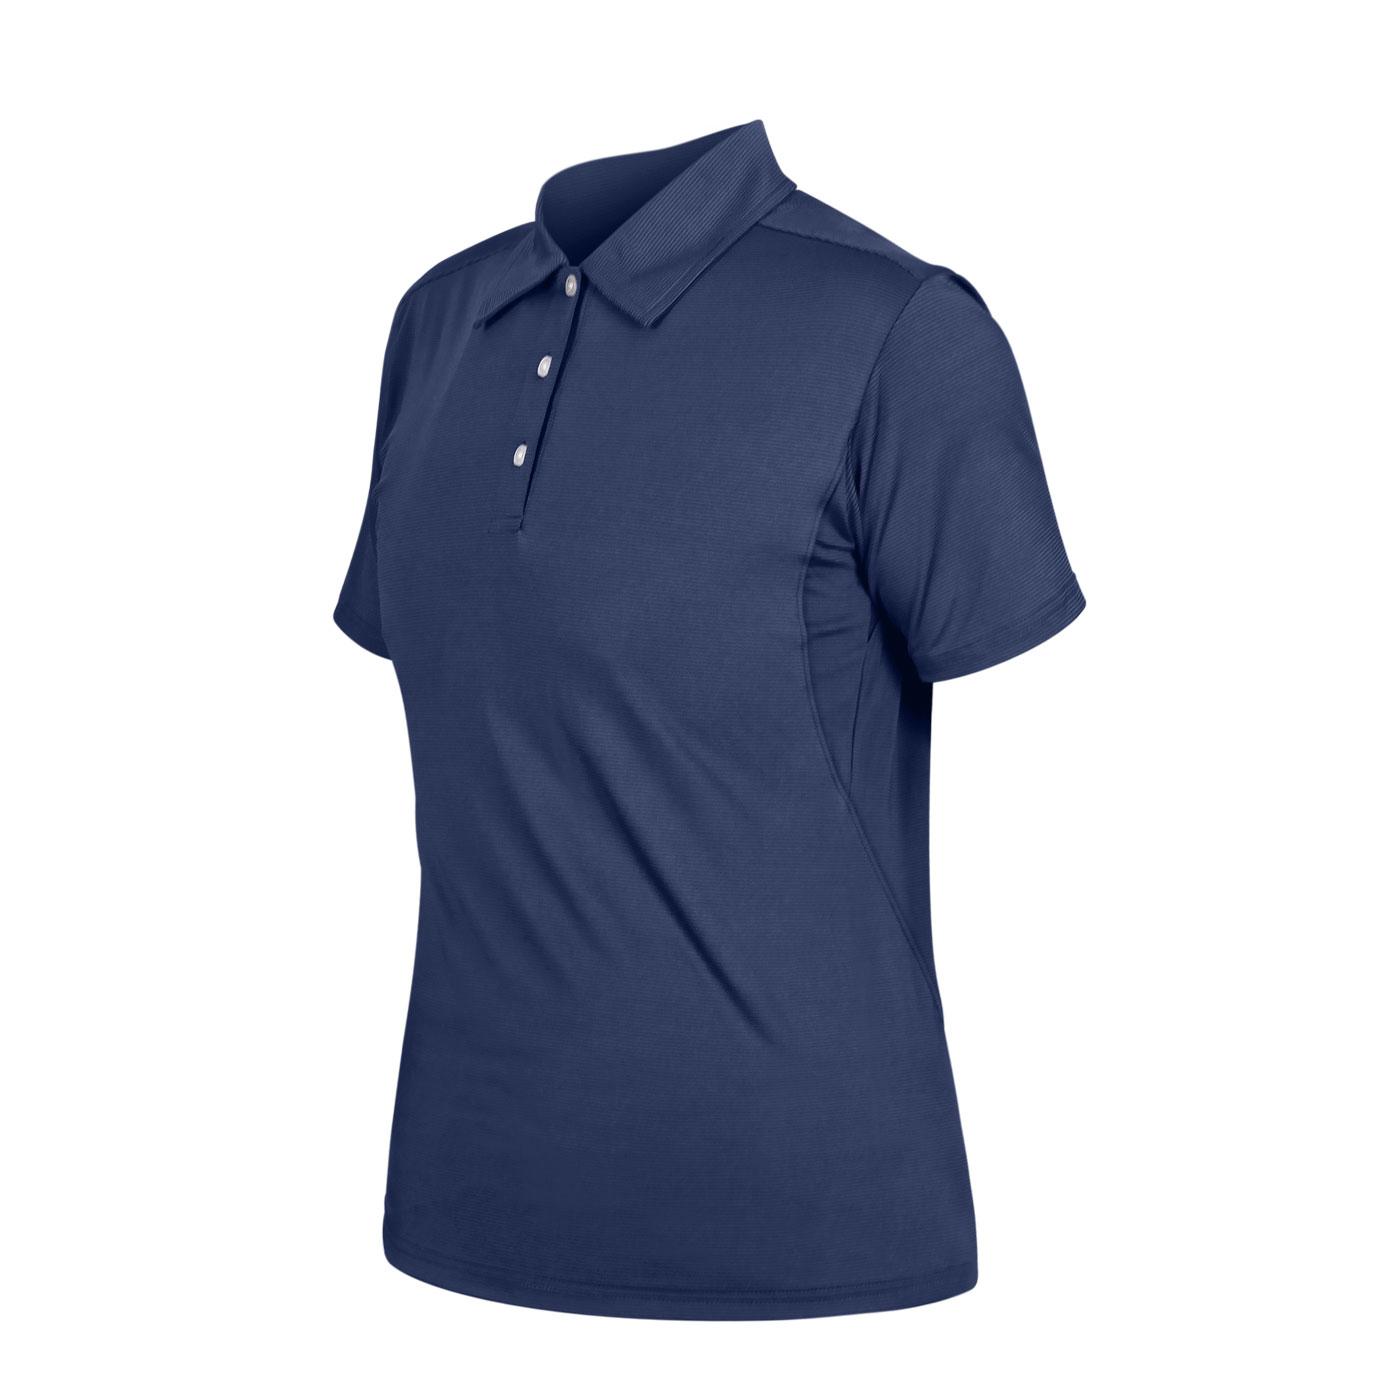 HODARLA 星魁剪接短袖POLO衫 3162101 - 丈青條紋